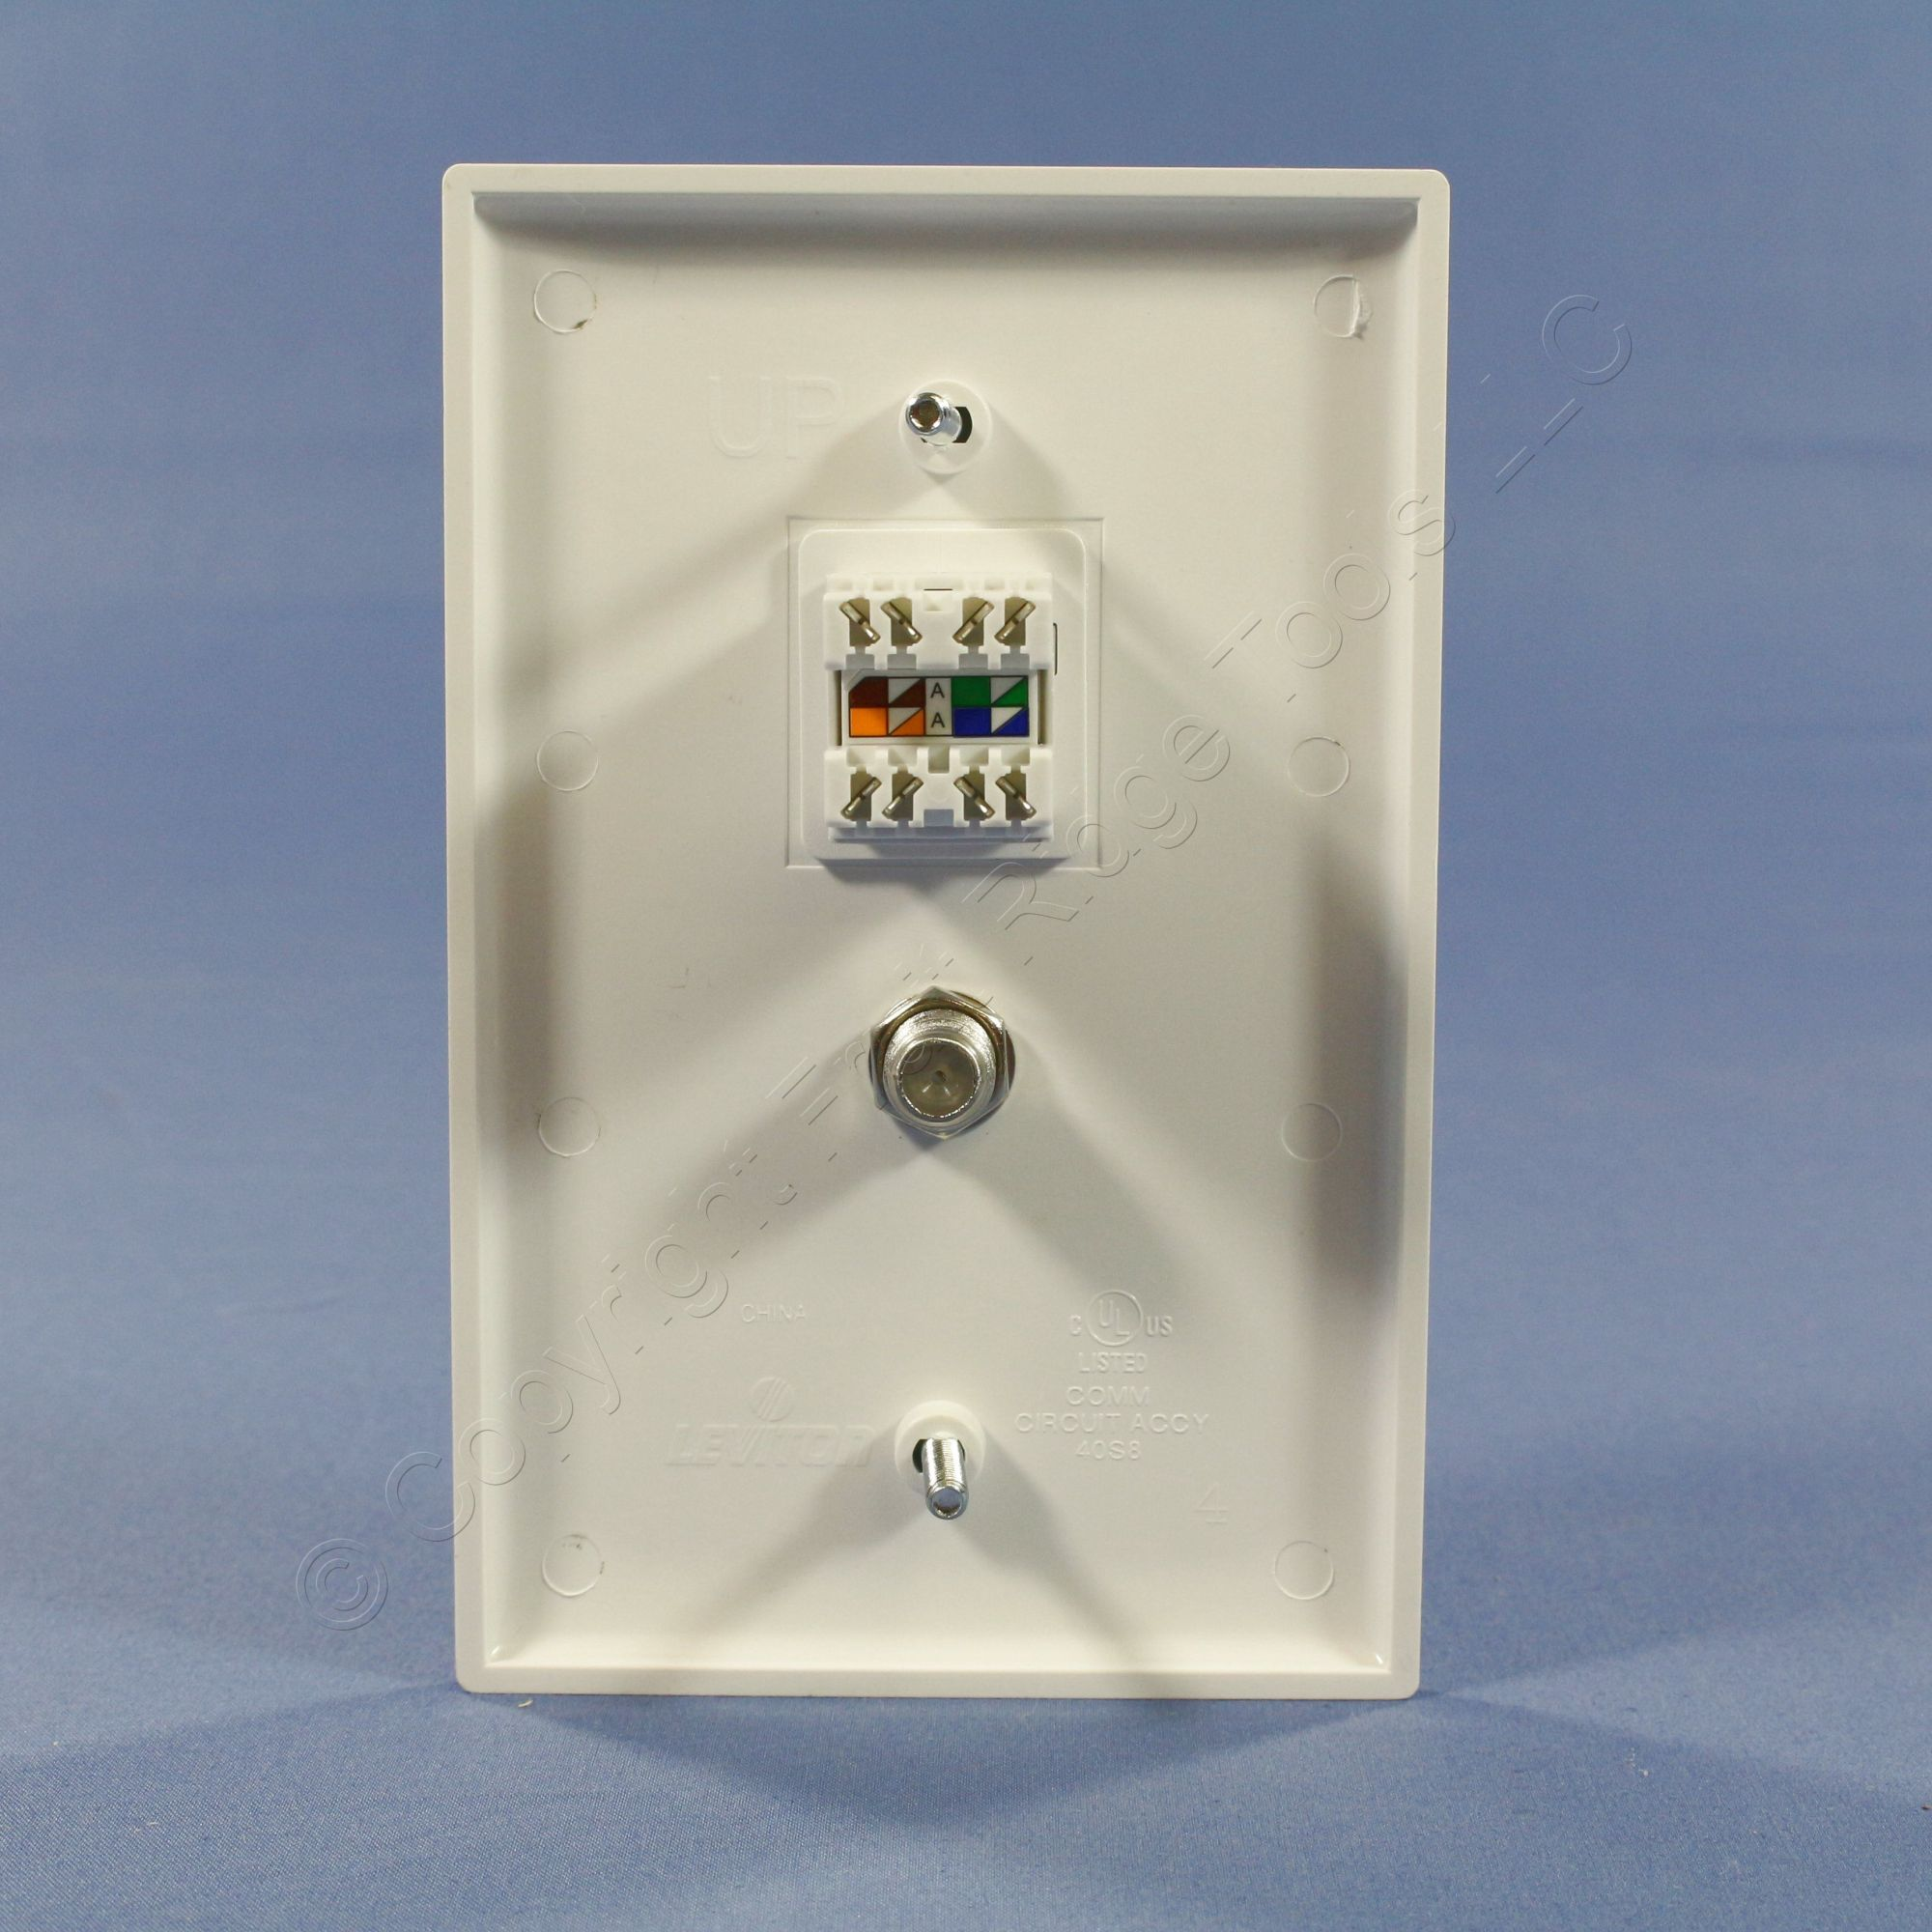 hight resolution of leviton cat 5e wall jacks moreover rj45 keystone jack wiring diagram